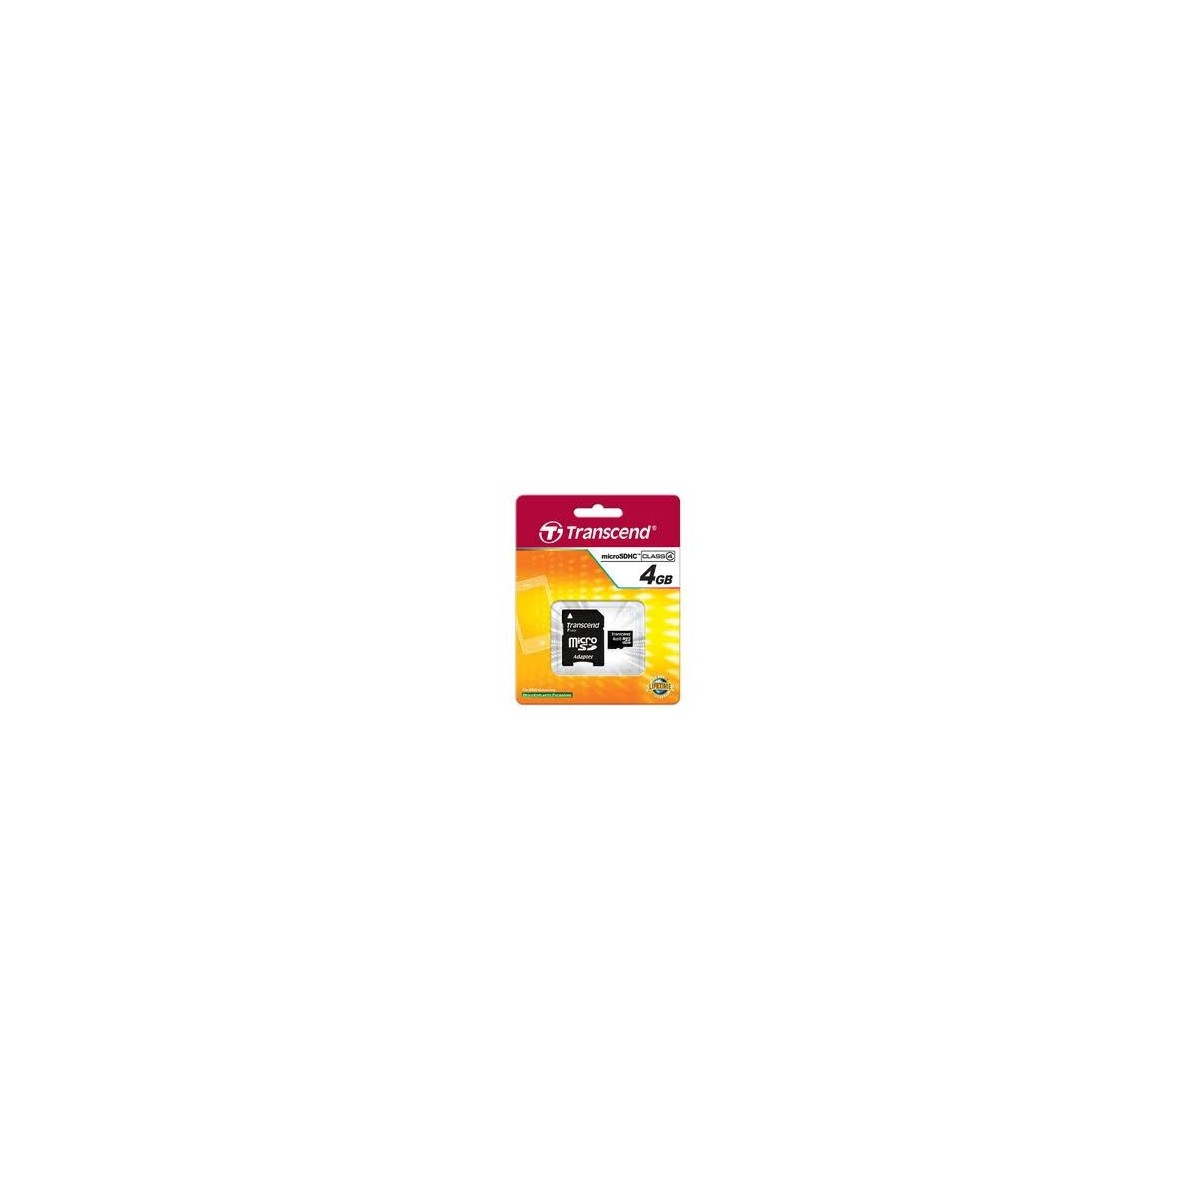 Carte Micro SDHC 4GB Class4 + Adaptateur - Transcend